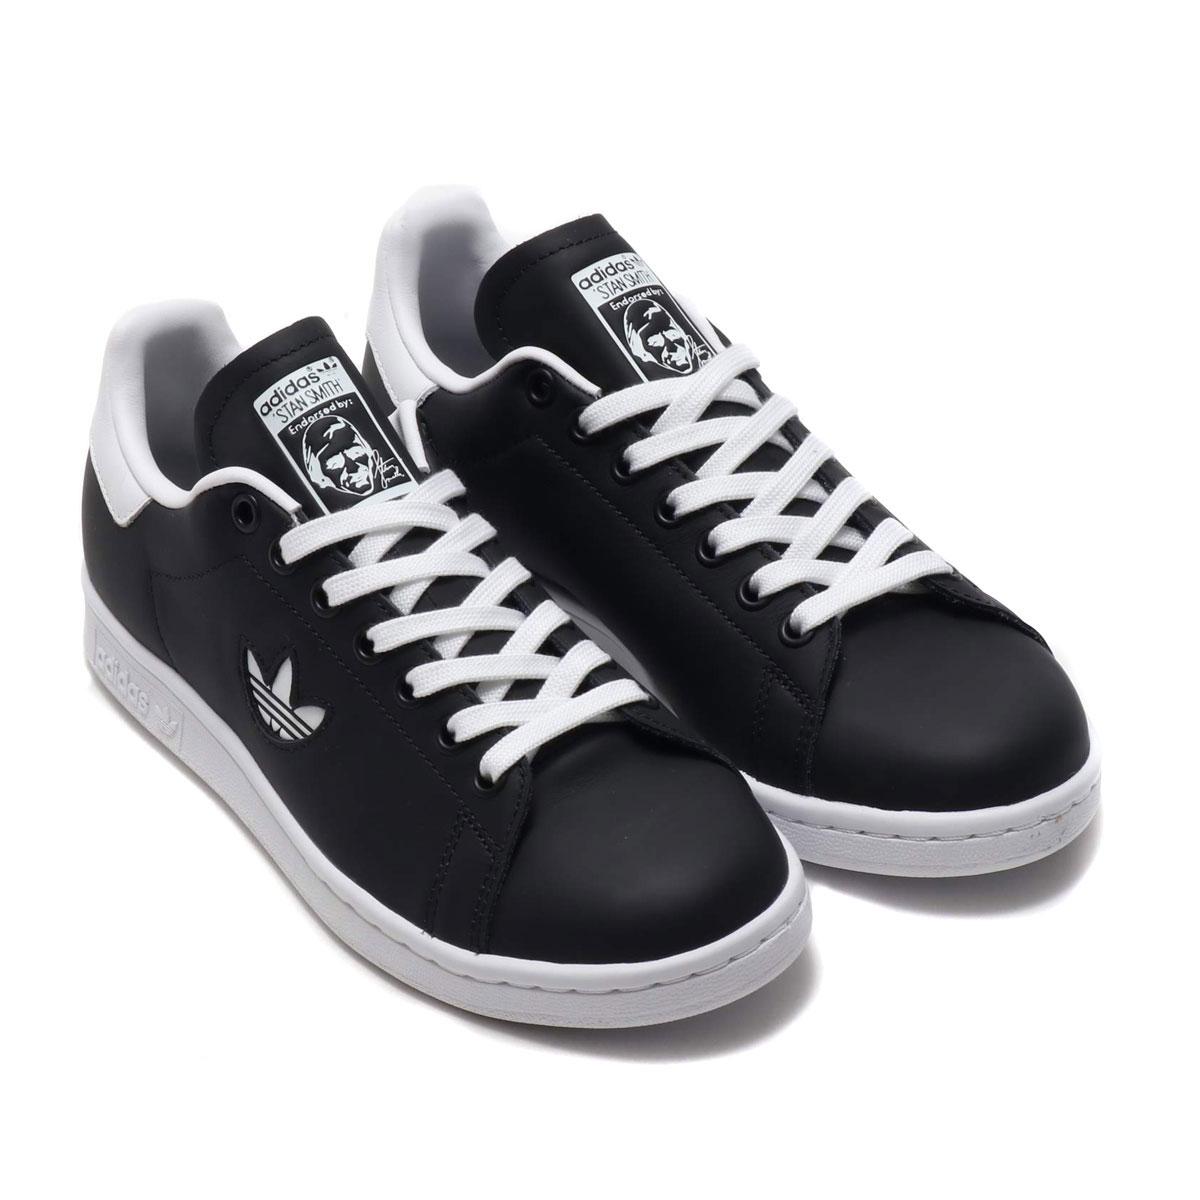 adidas Originals STAN SMITH (アディダスオリジナルス スタンスミス)CORE BLACK/FTWR WHITE/CORE BLACK【レディース スニーカー】19SS-S